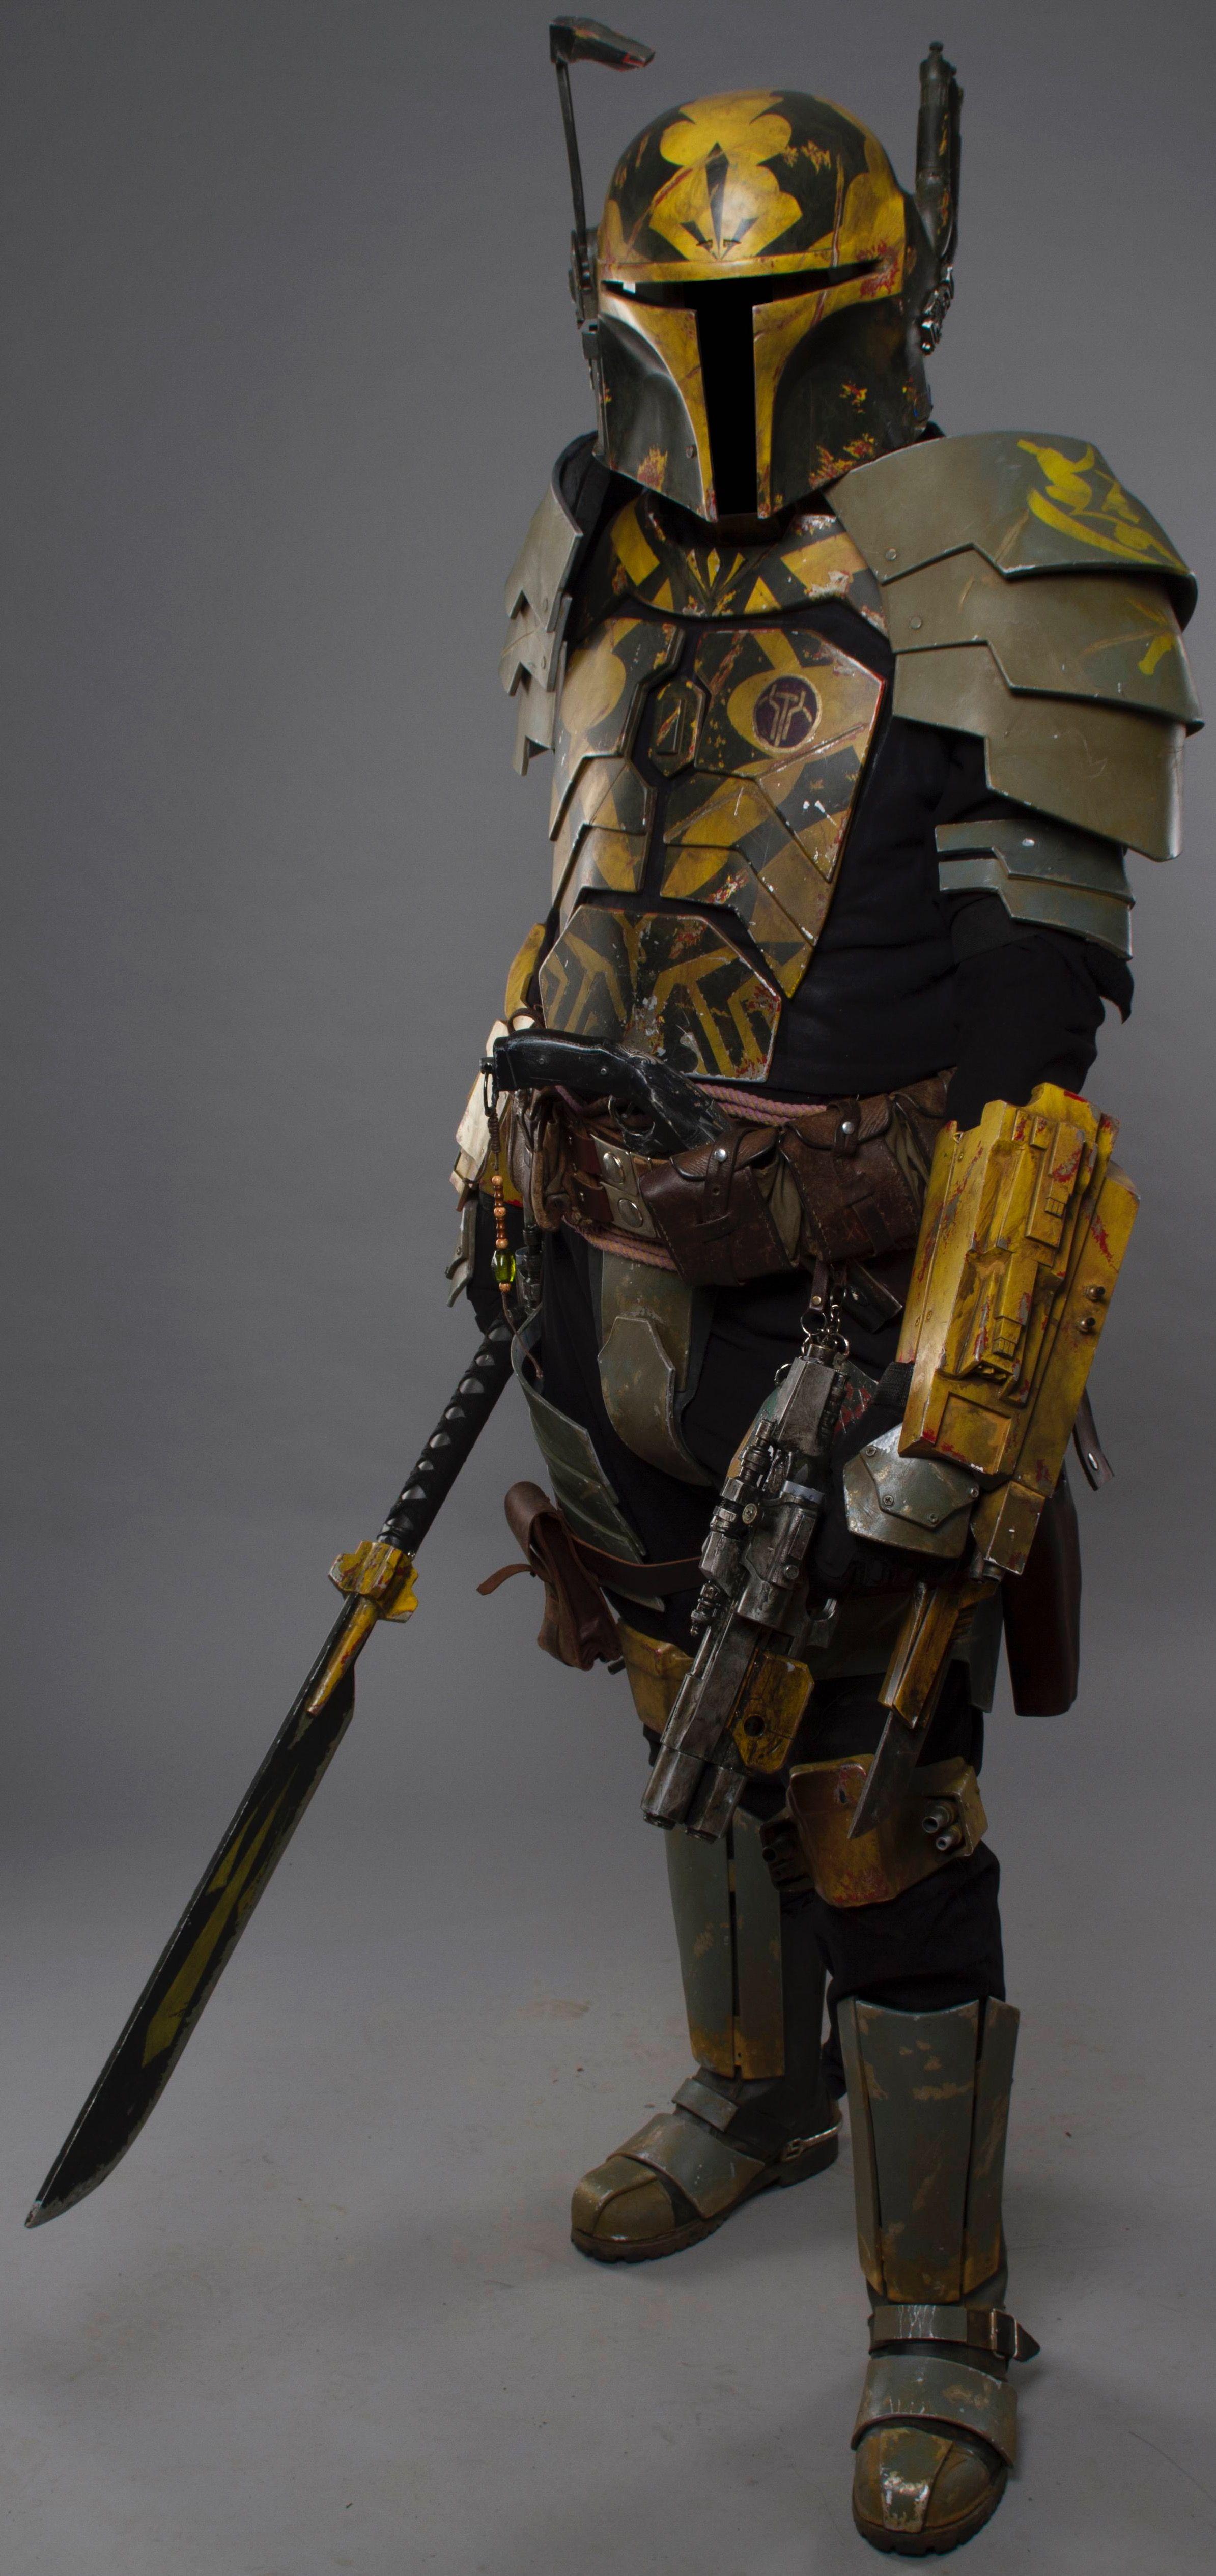 Pin by Noah Guire on Mandalorian Armor Star wars